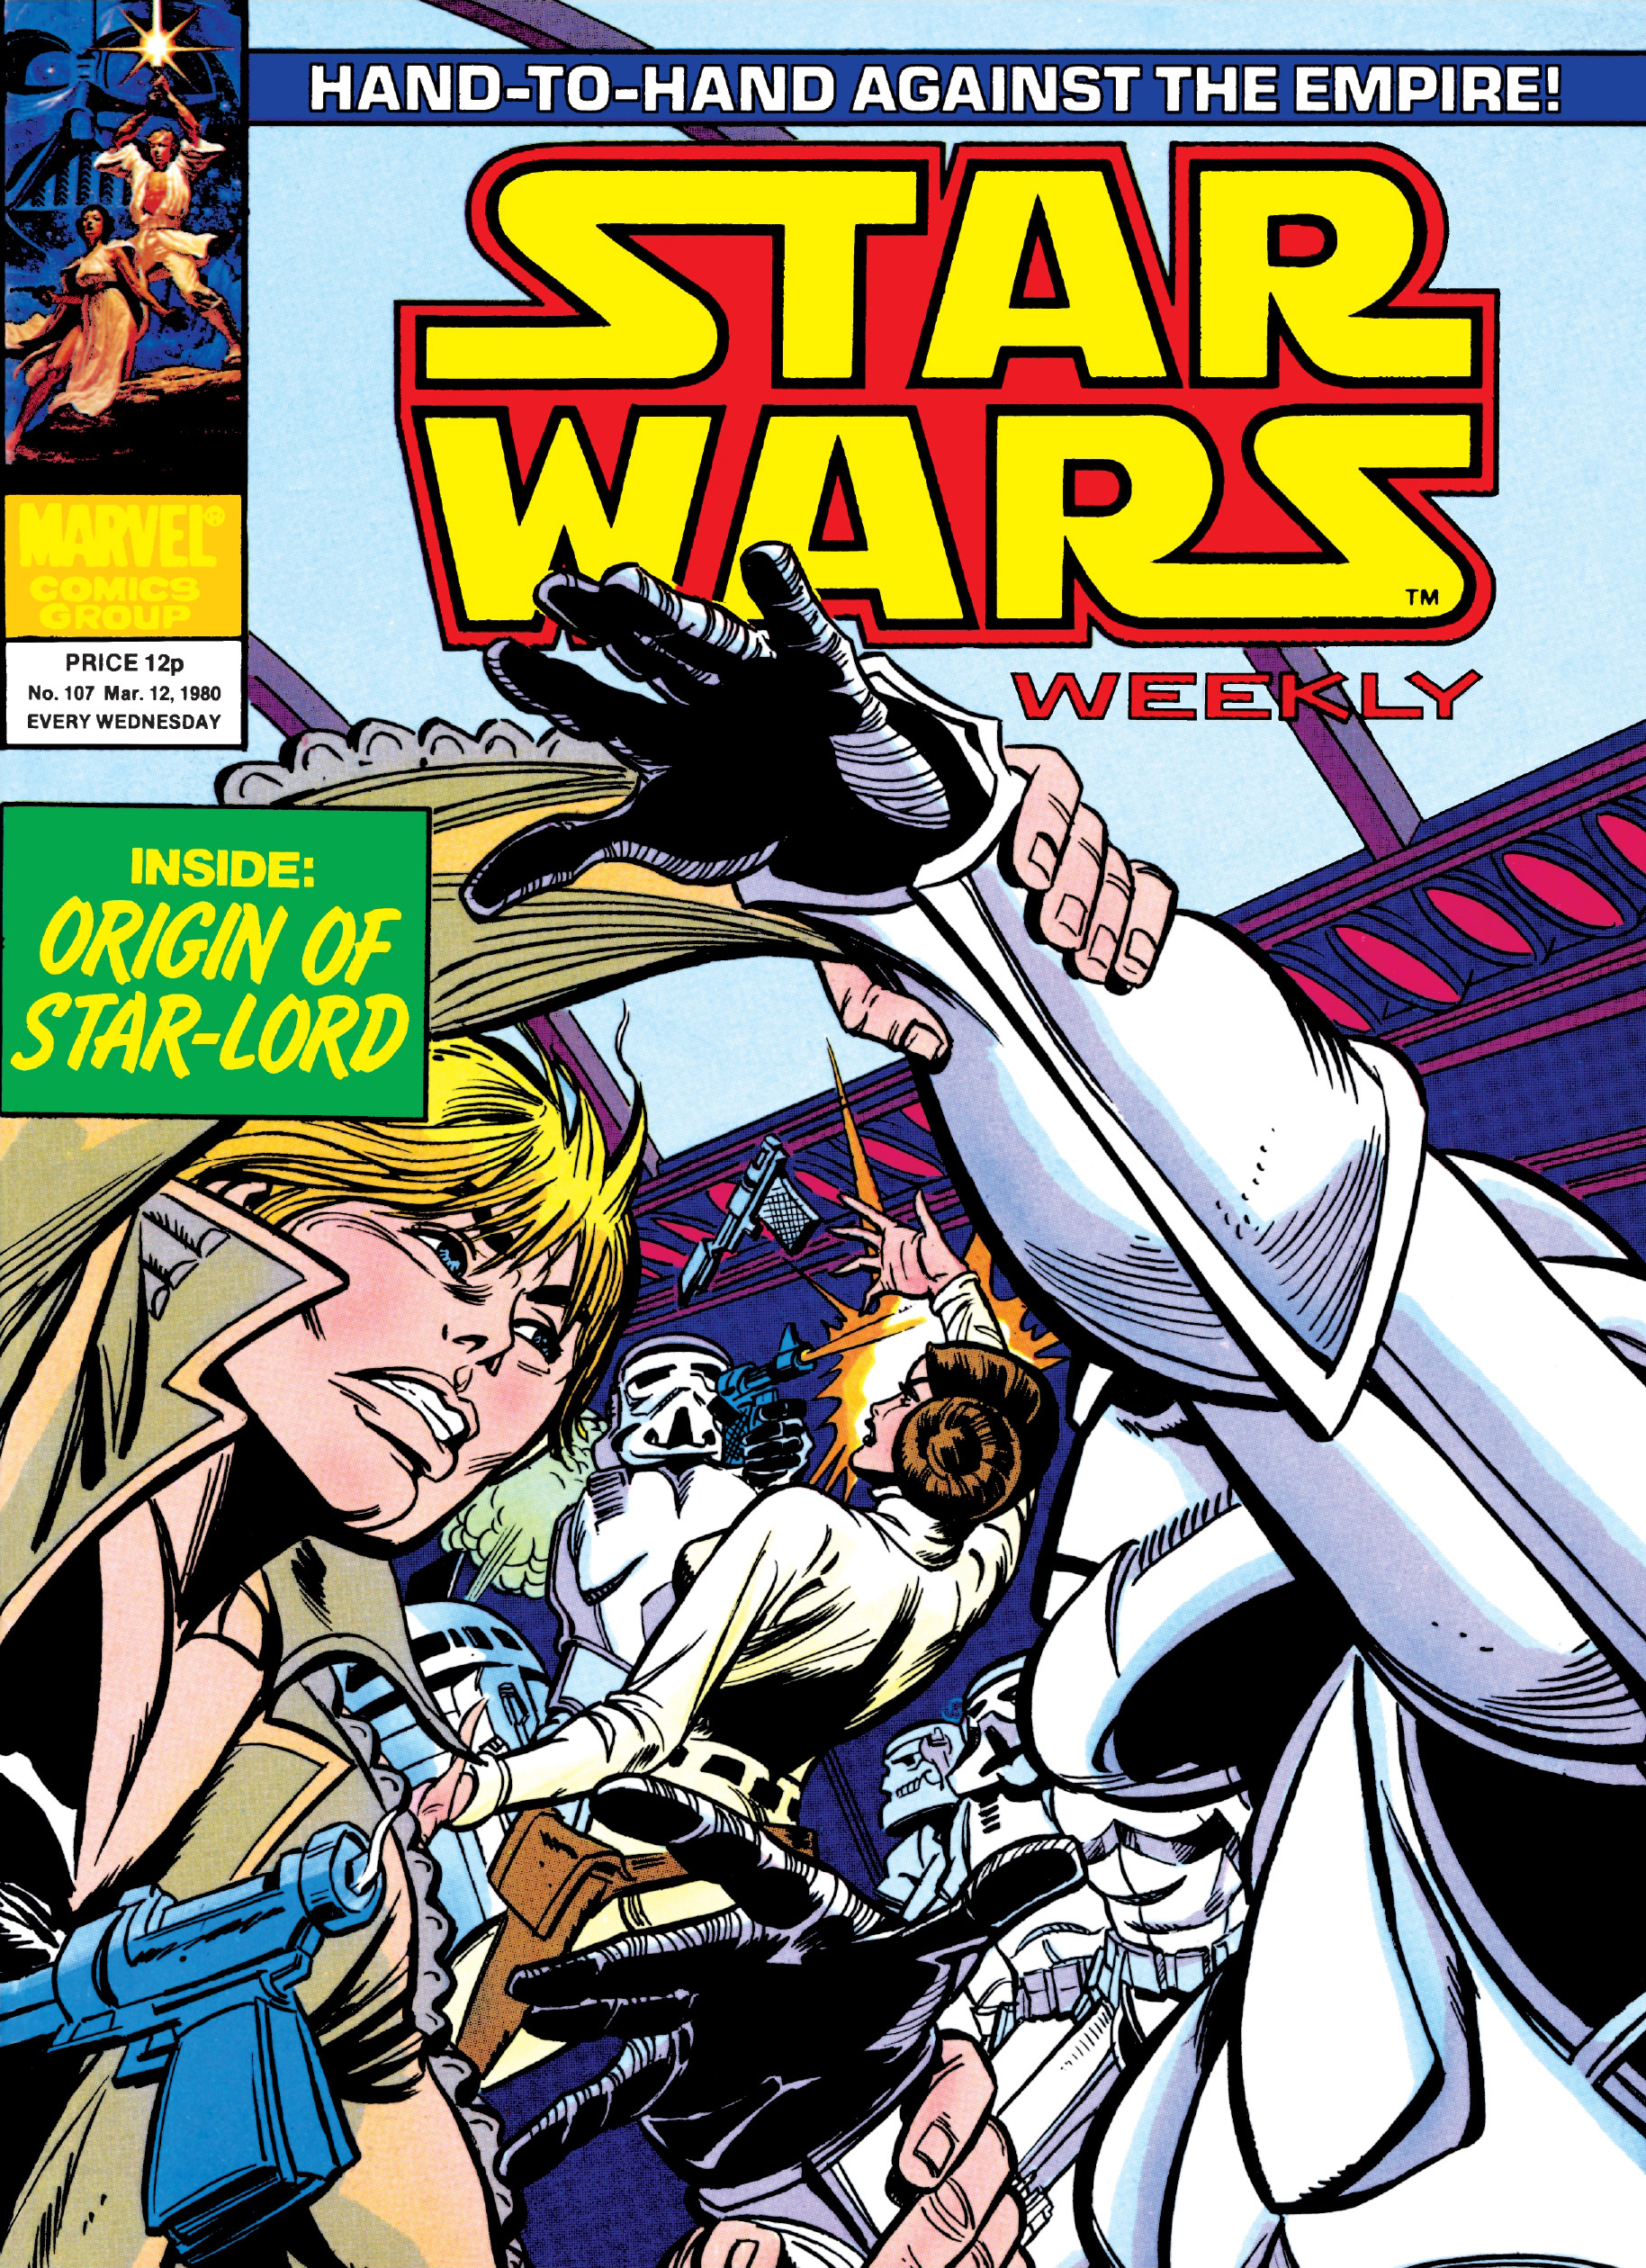 Star Wars Weekly 107